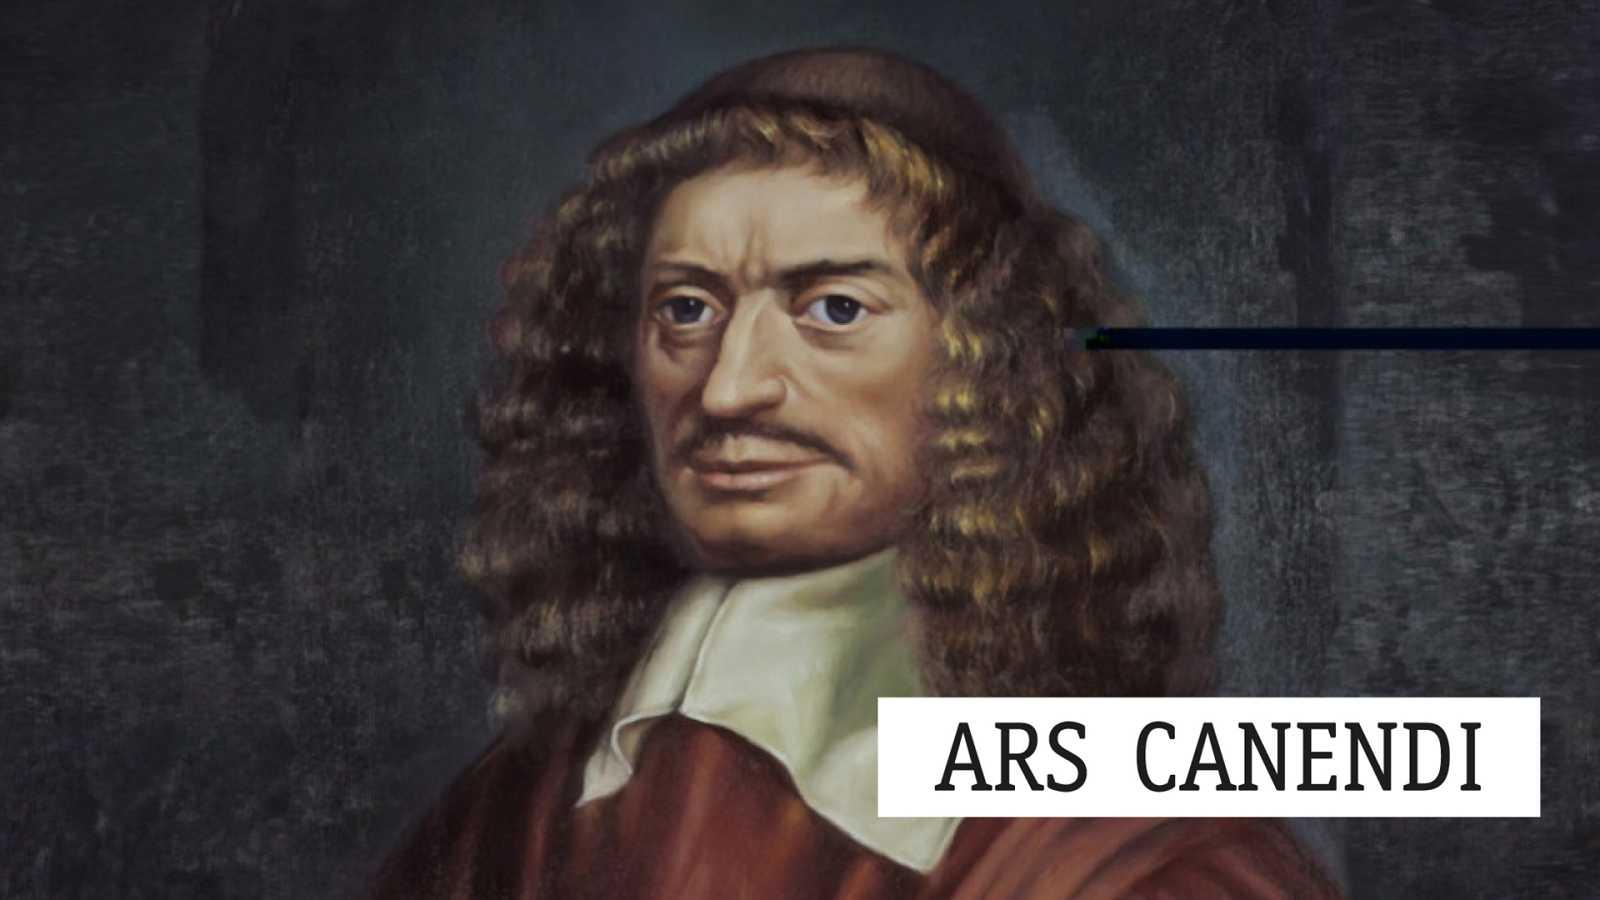 Ars canendi - Nuestras voces: Carmen Solís - 15/11/20 - escuchar ahora